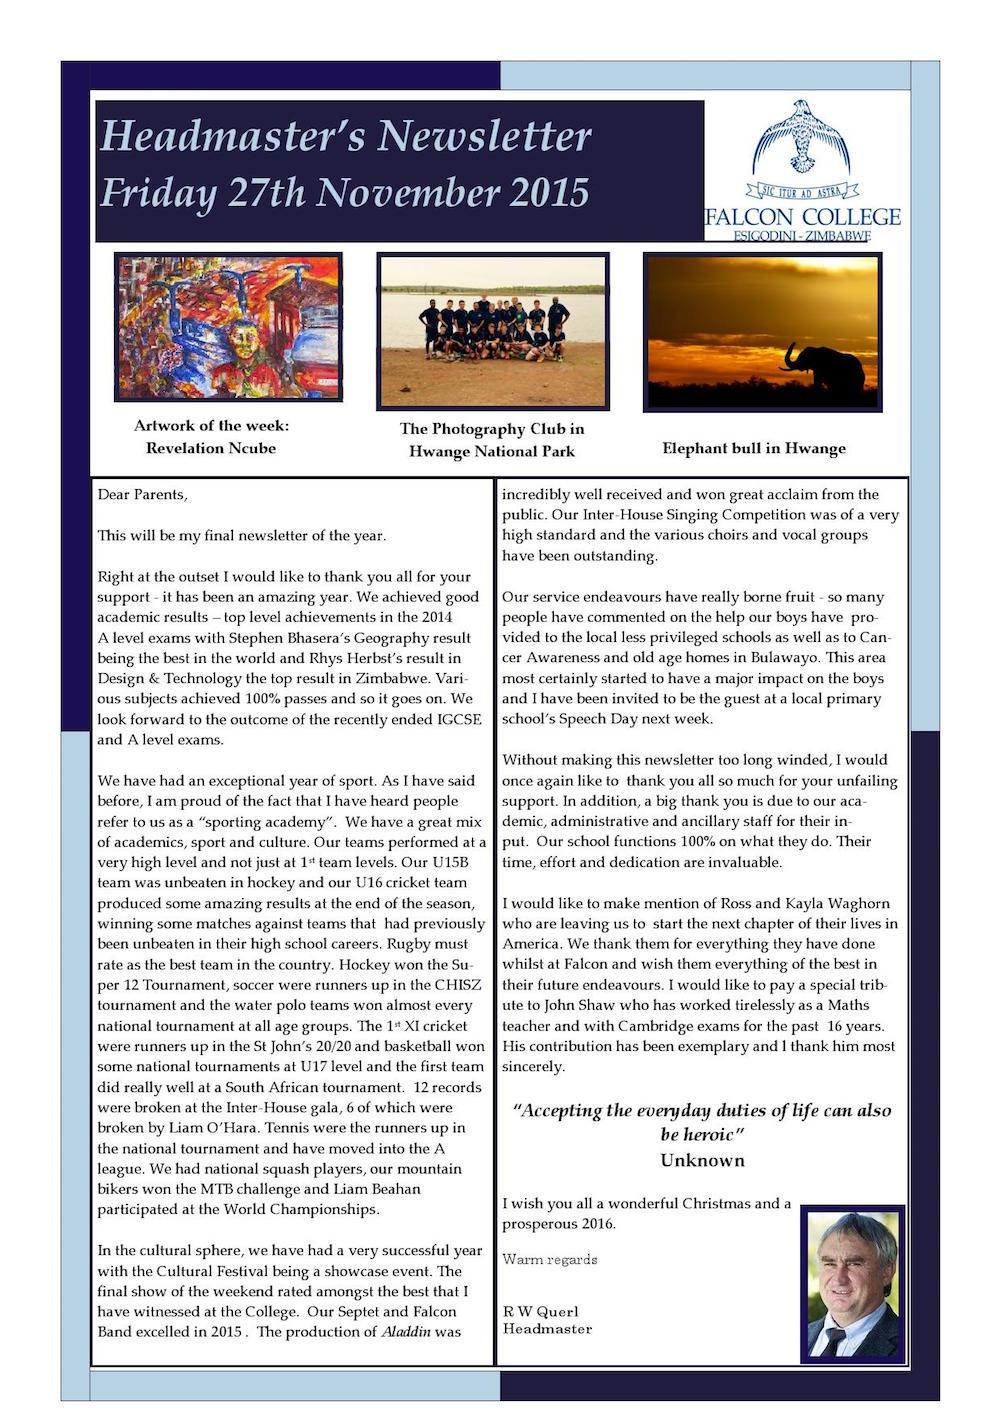 Headmaster's Newsletter Friday 27th November 2015 edited_000001